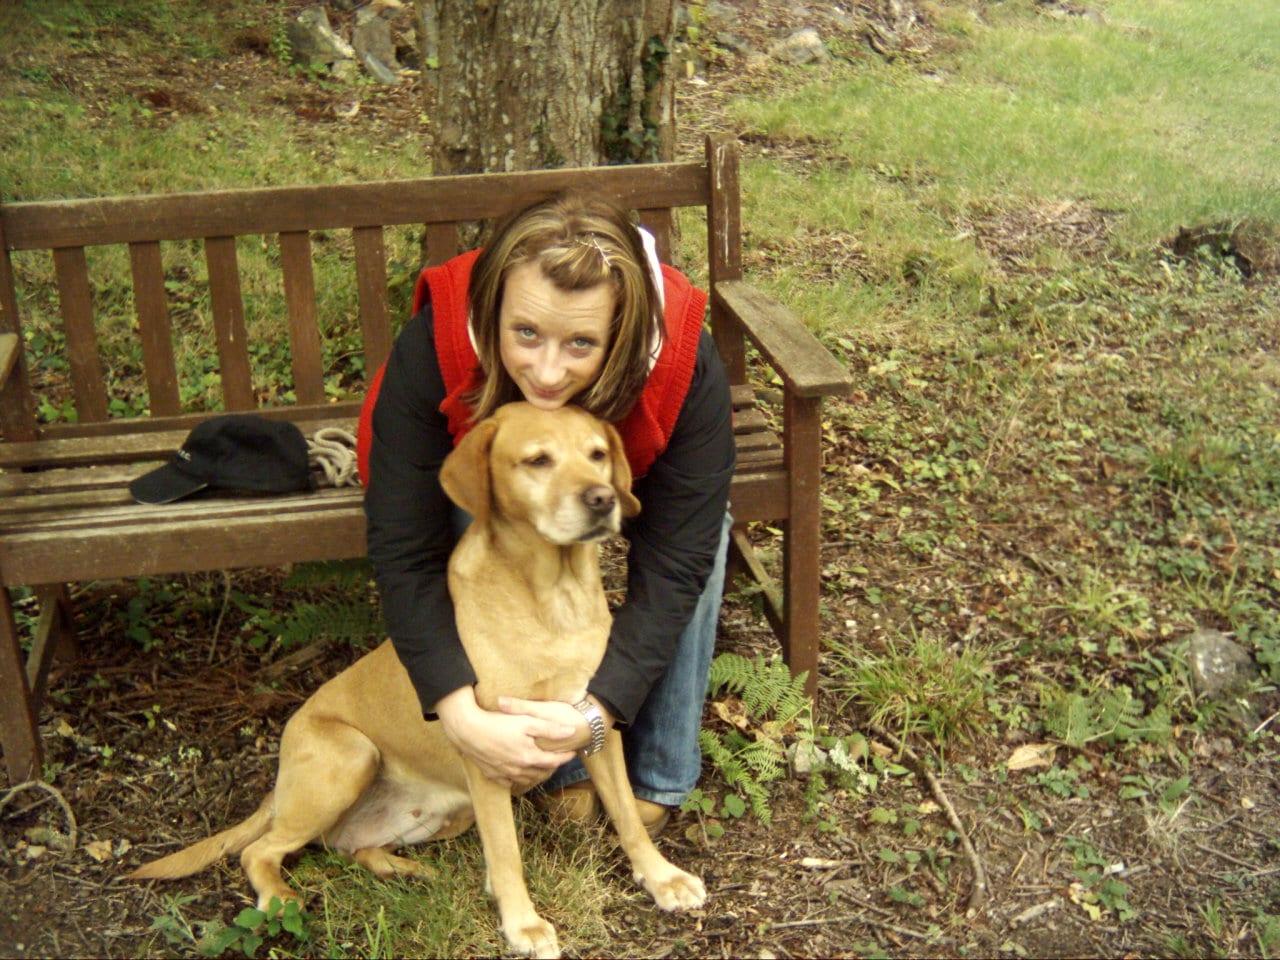 Kim O'Meara dogsblog.com co-founder & Chloe